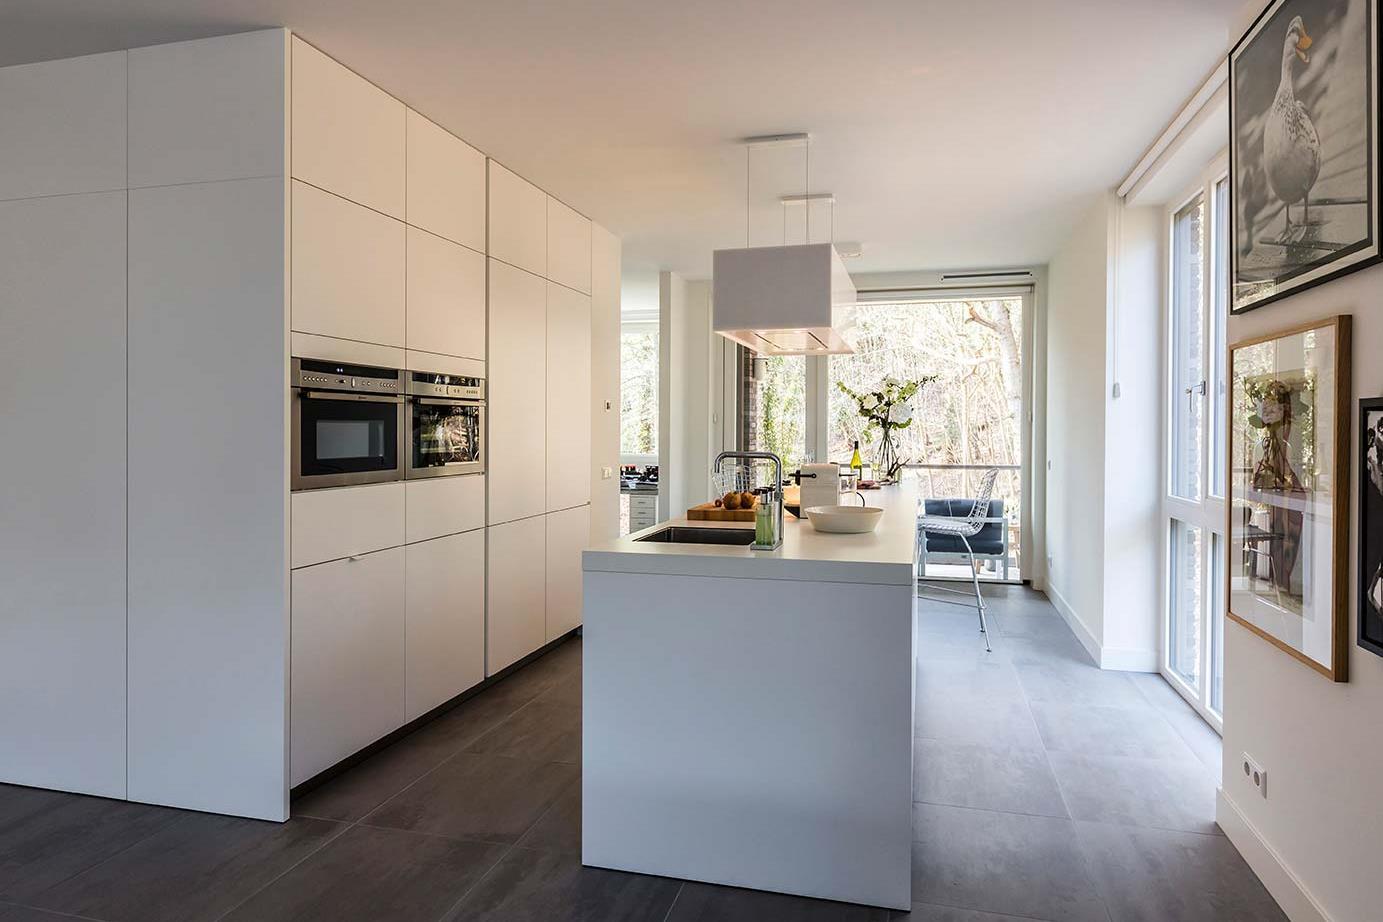 Siematic Keuken Accessoires : SieMatic keuken